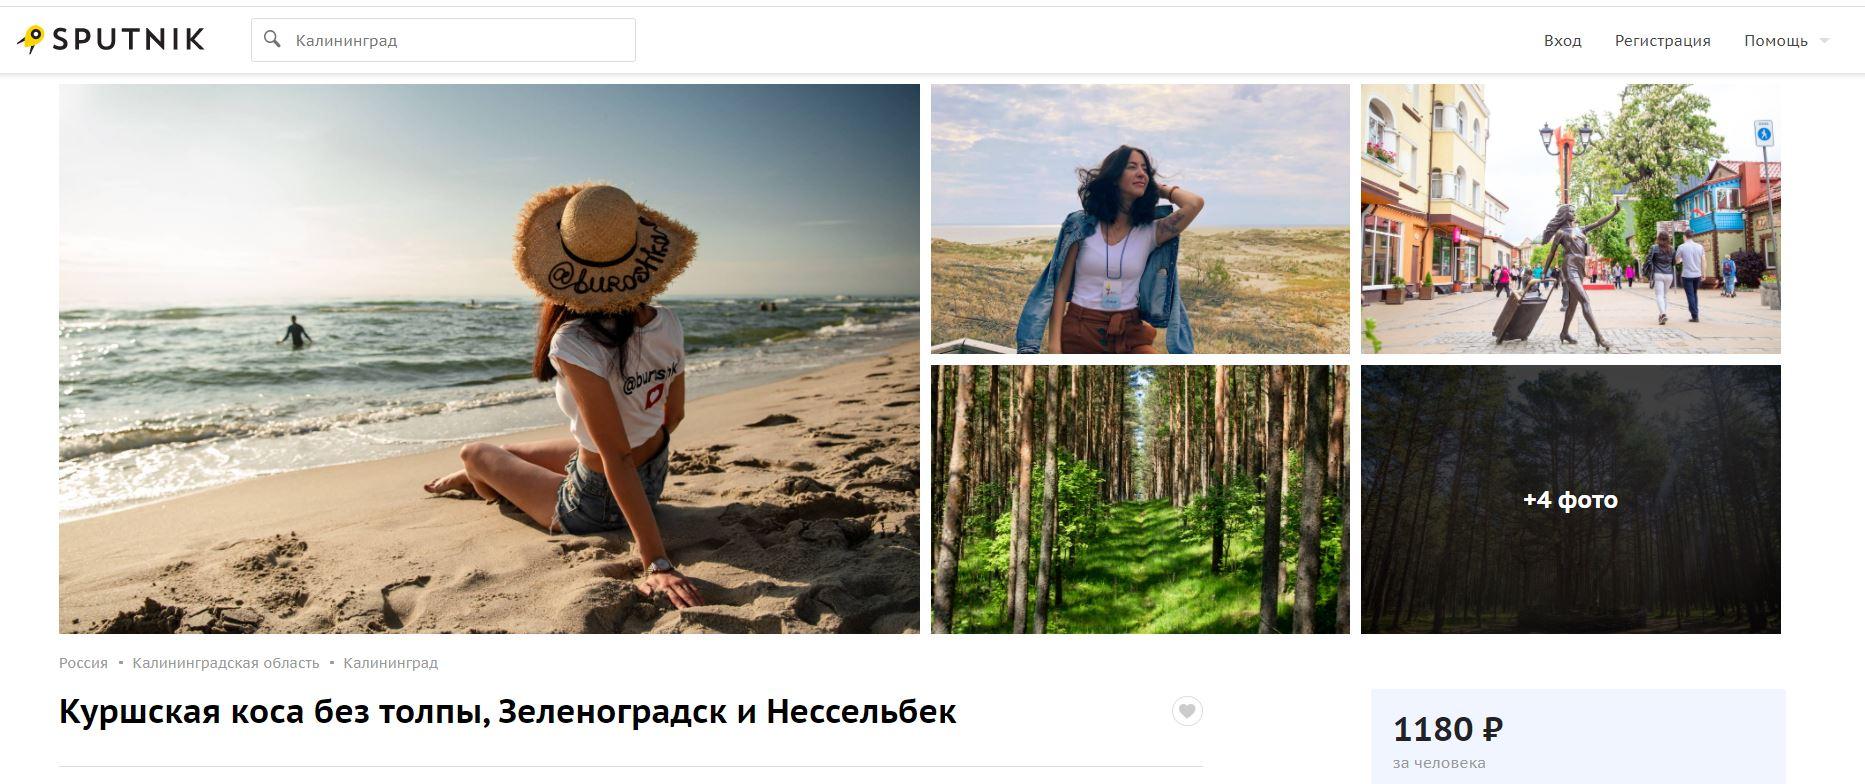 ТОП-5 экскурсий на Куршскую косу из Калининграда и Зеленоградска 2021